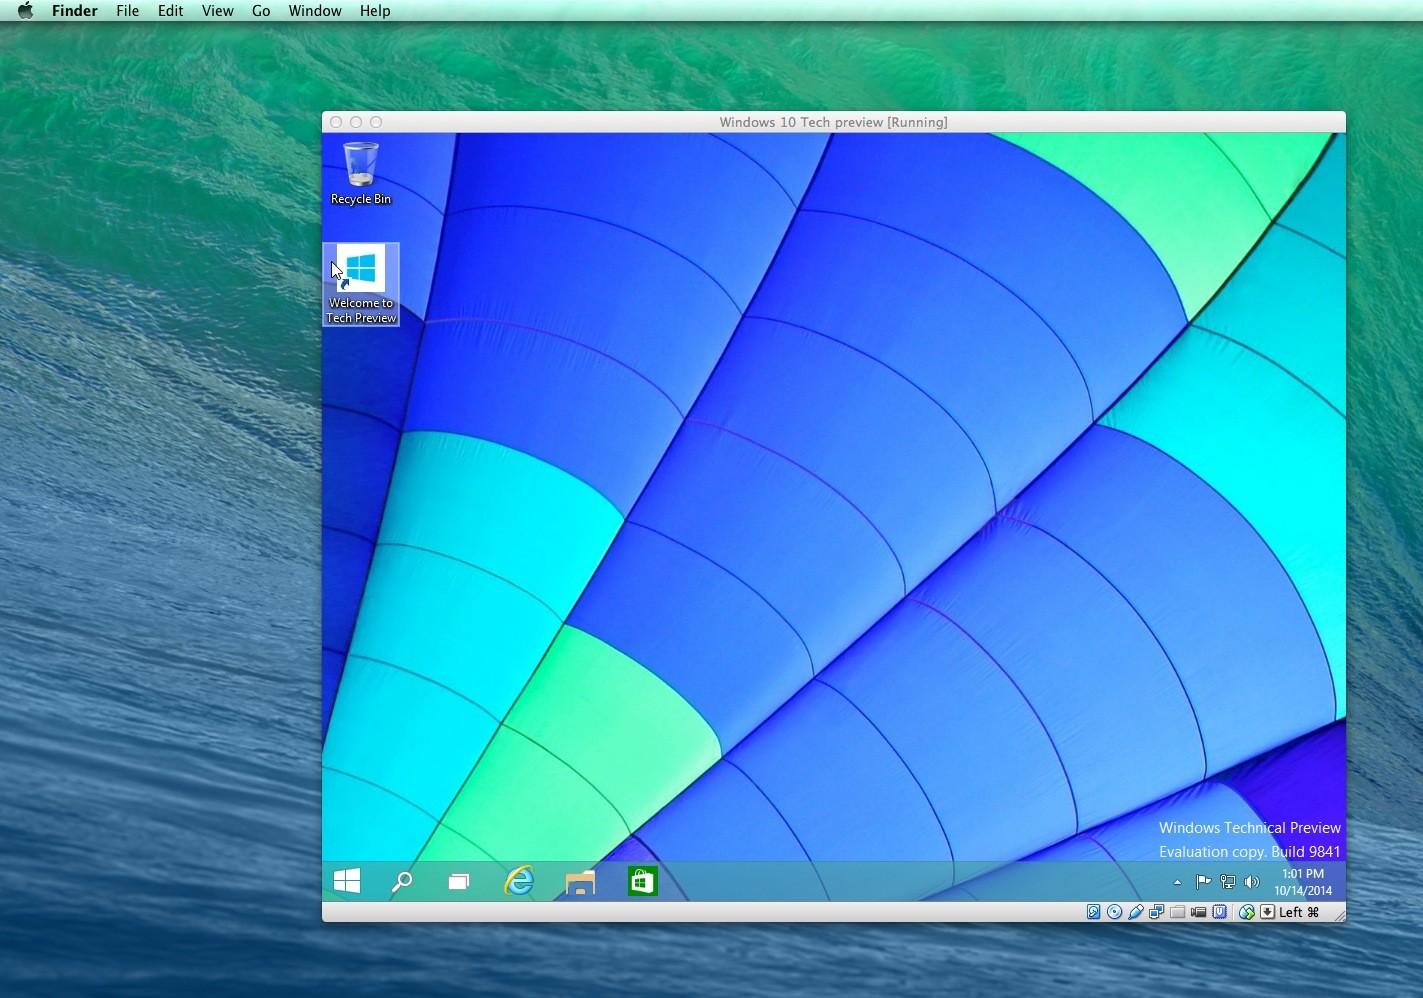 Install windows 10 using virtualbox on mac windows 10 running in virtualbox ccuart Image collections